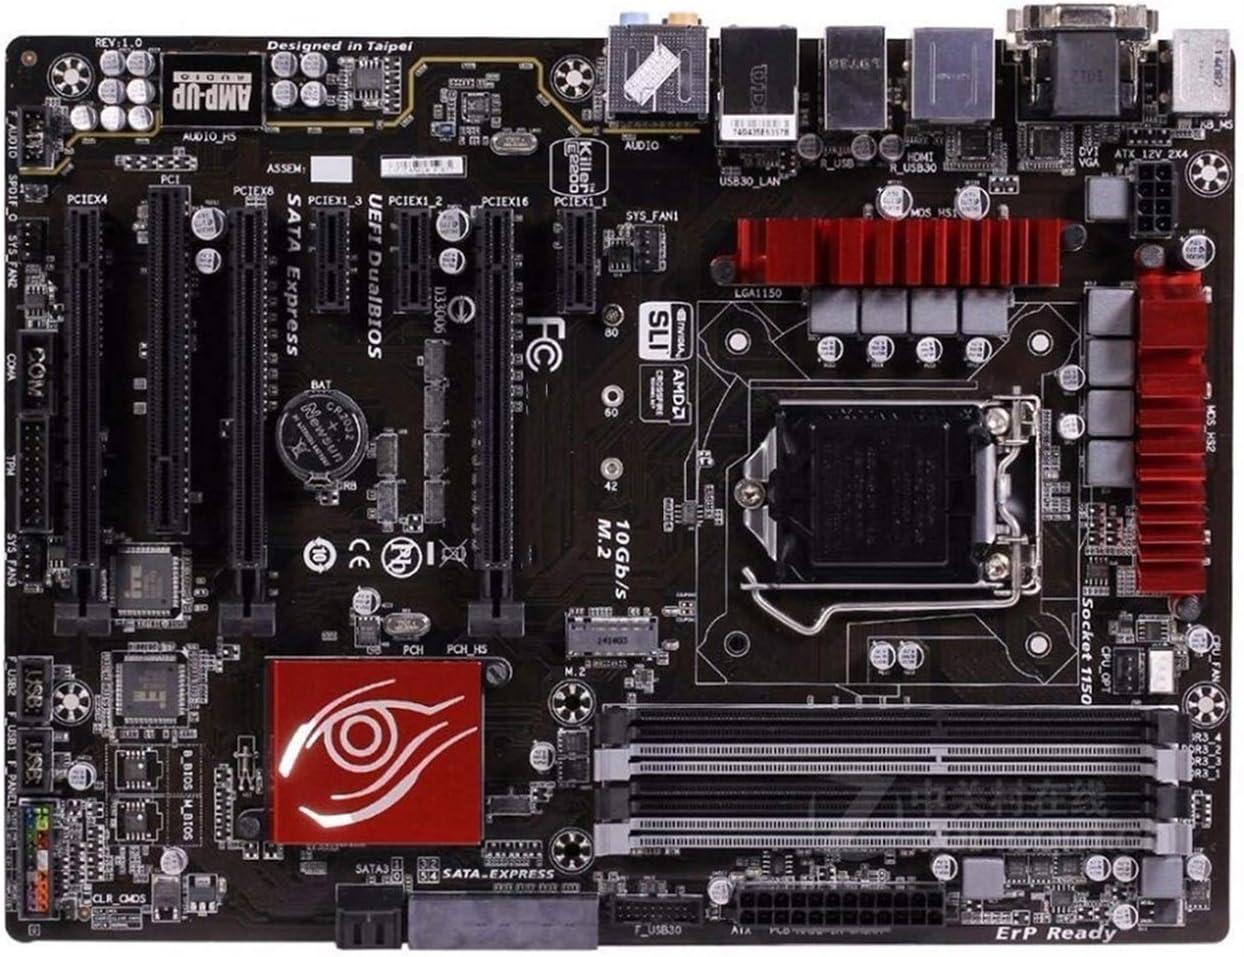 Placa Base De La Computadora Fit For Gigabyte GA-Z97X-GAMING 3 Placa Base Z97X-GAMING 3 Z97 Slot LGA 1150 DDR3 USB3.0 SATA3.0